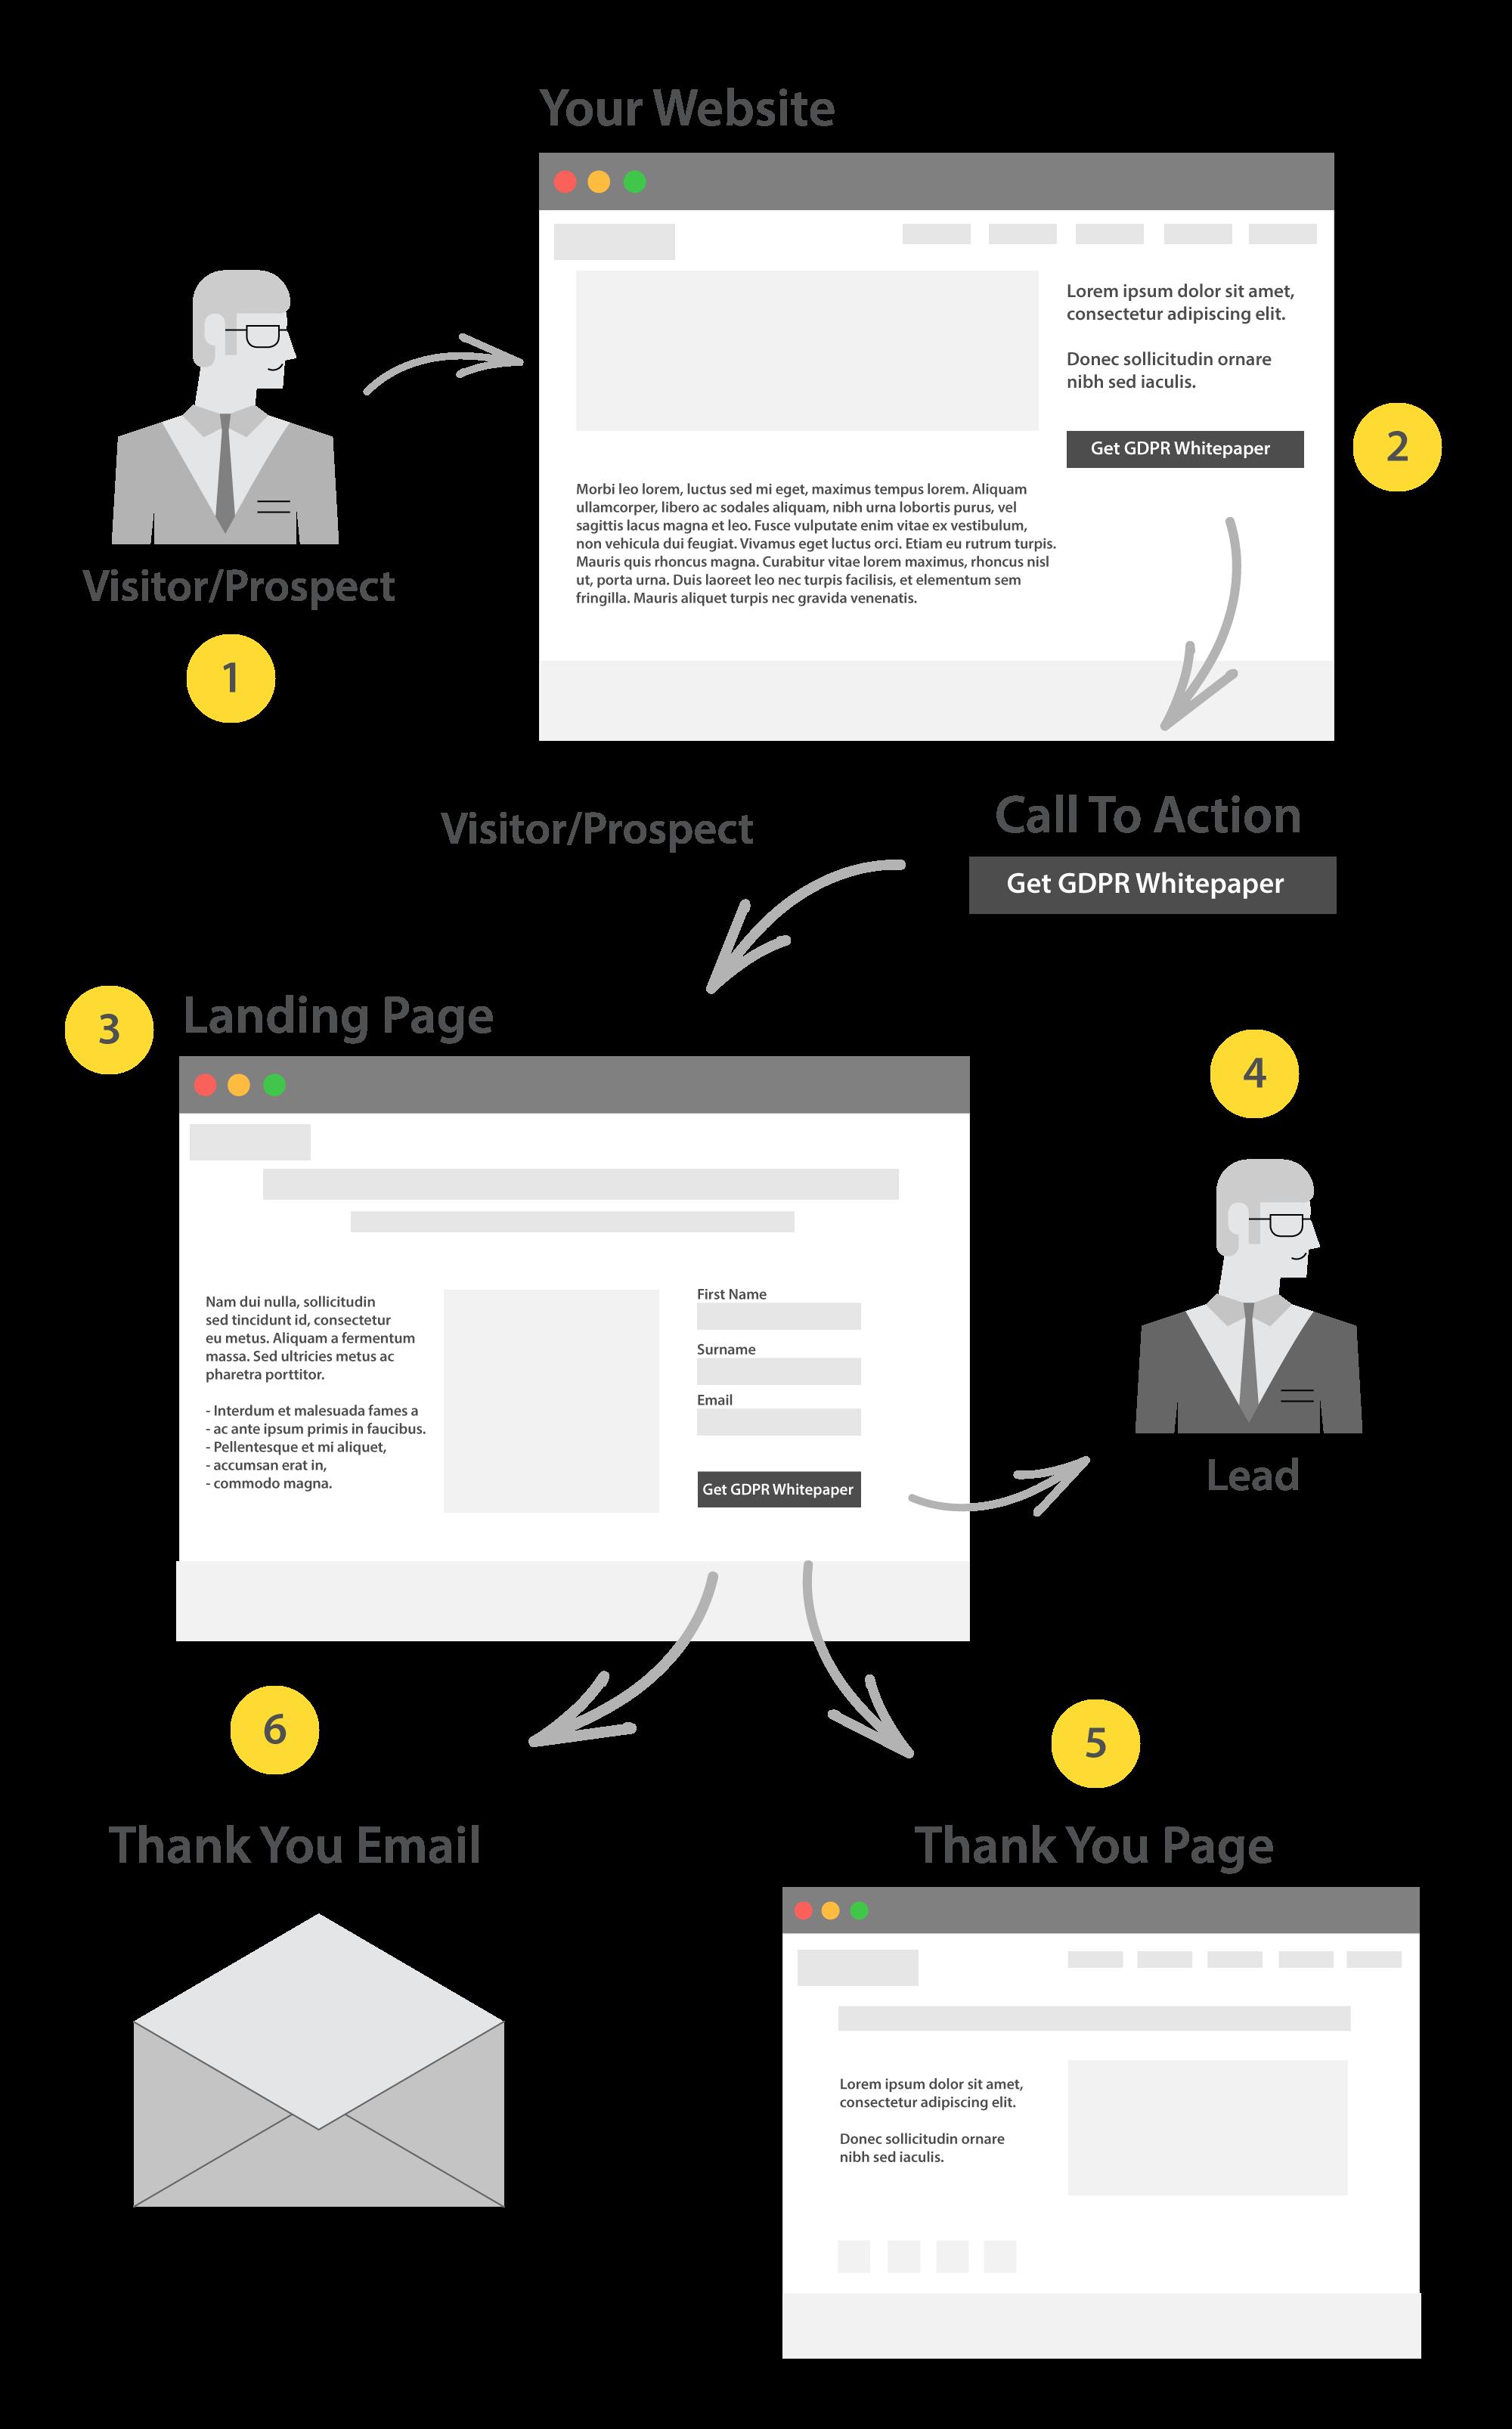 How to Run An Inbound Marketing Campaign - Inbound Conversion Process